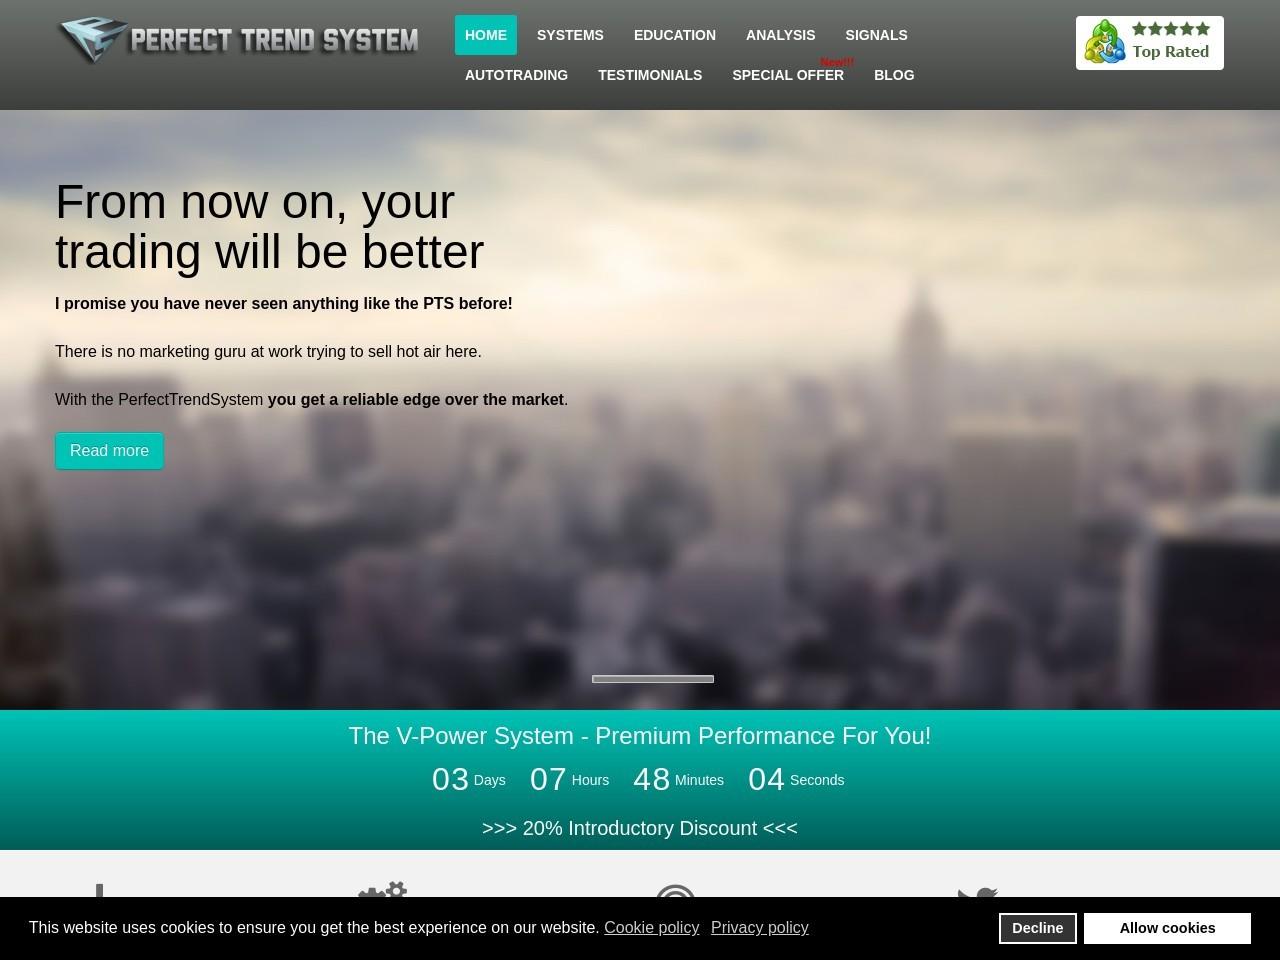 perfecttrendsystem.com